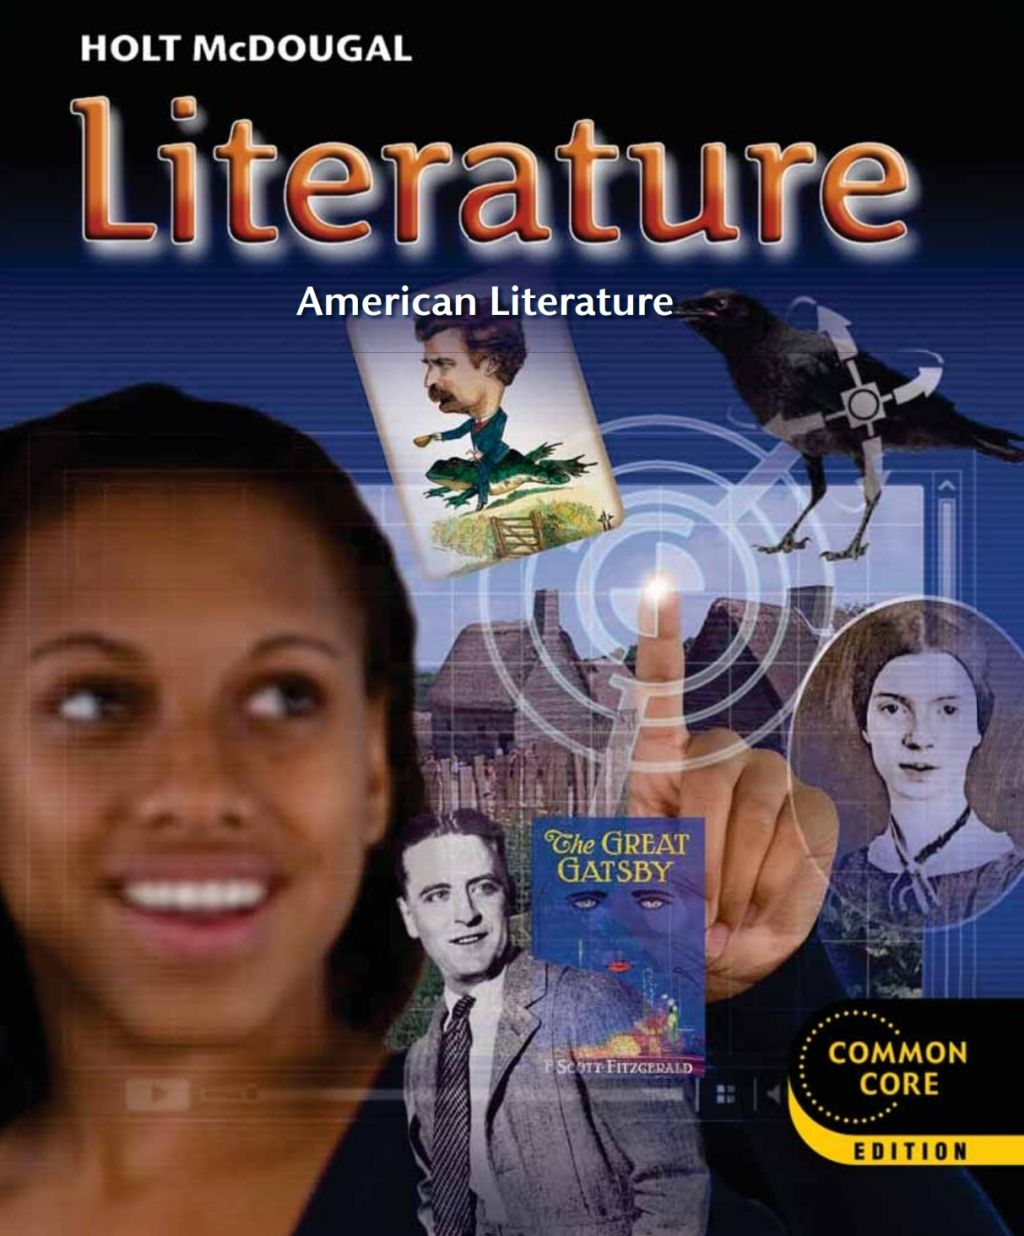 Holt McDougal Literature Student Edition Grade 11